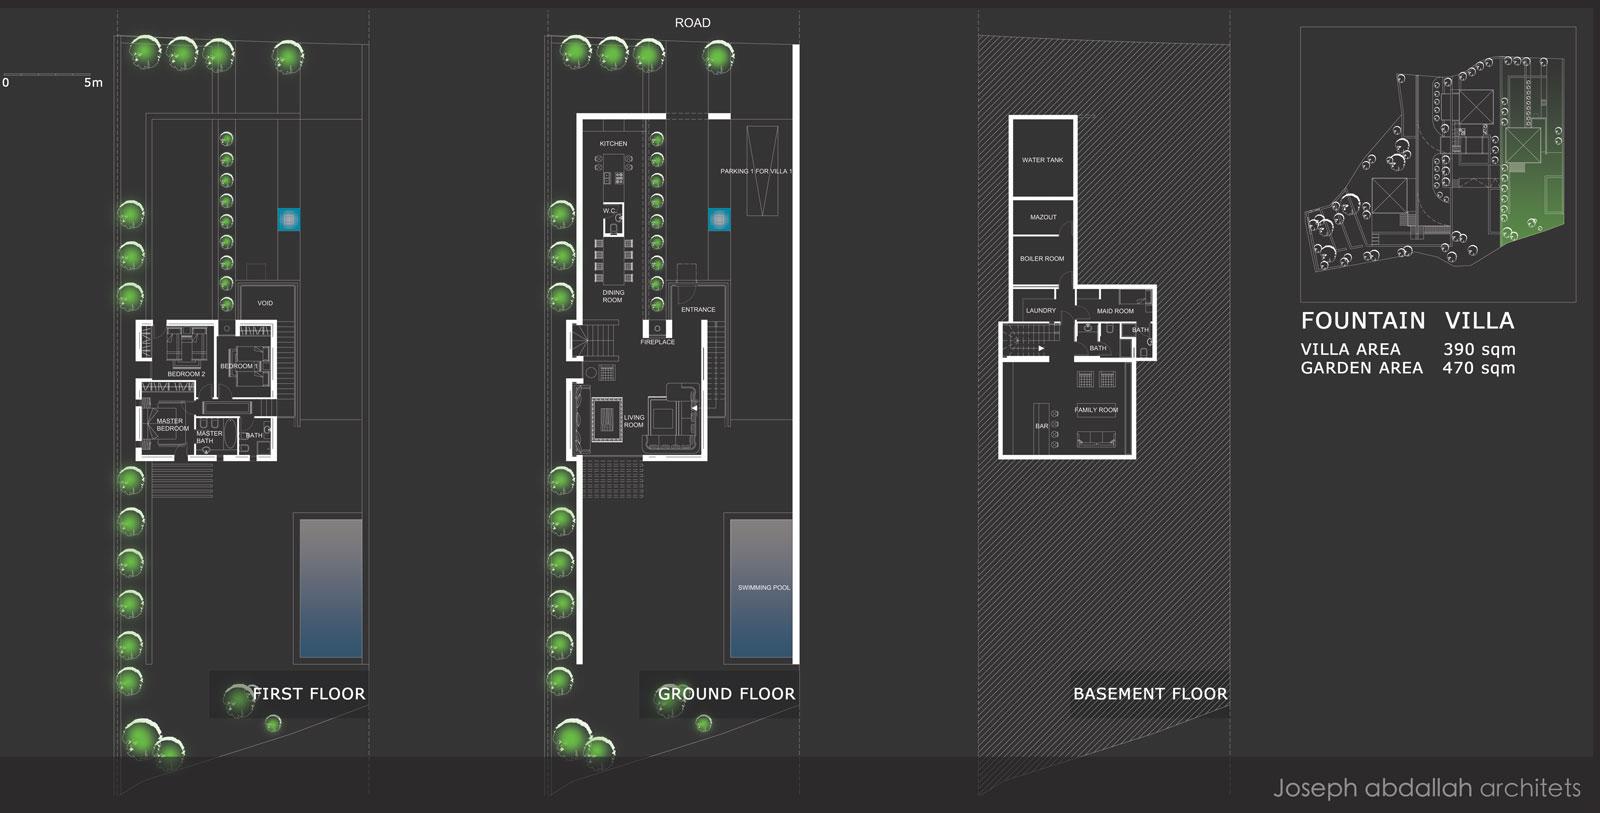 domaine-du-chene-lebanese-traditional-achitecture-joseph-abdallah-architects-villa1p